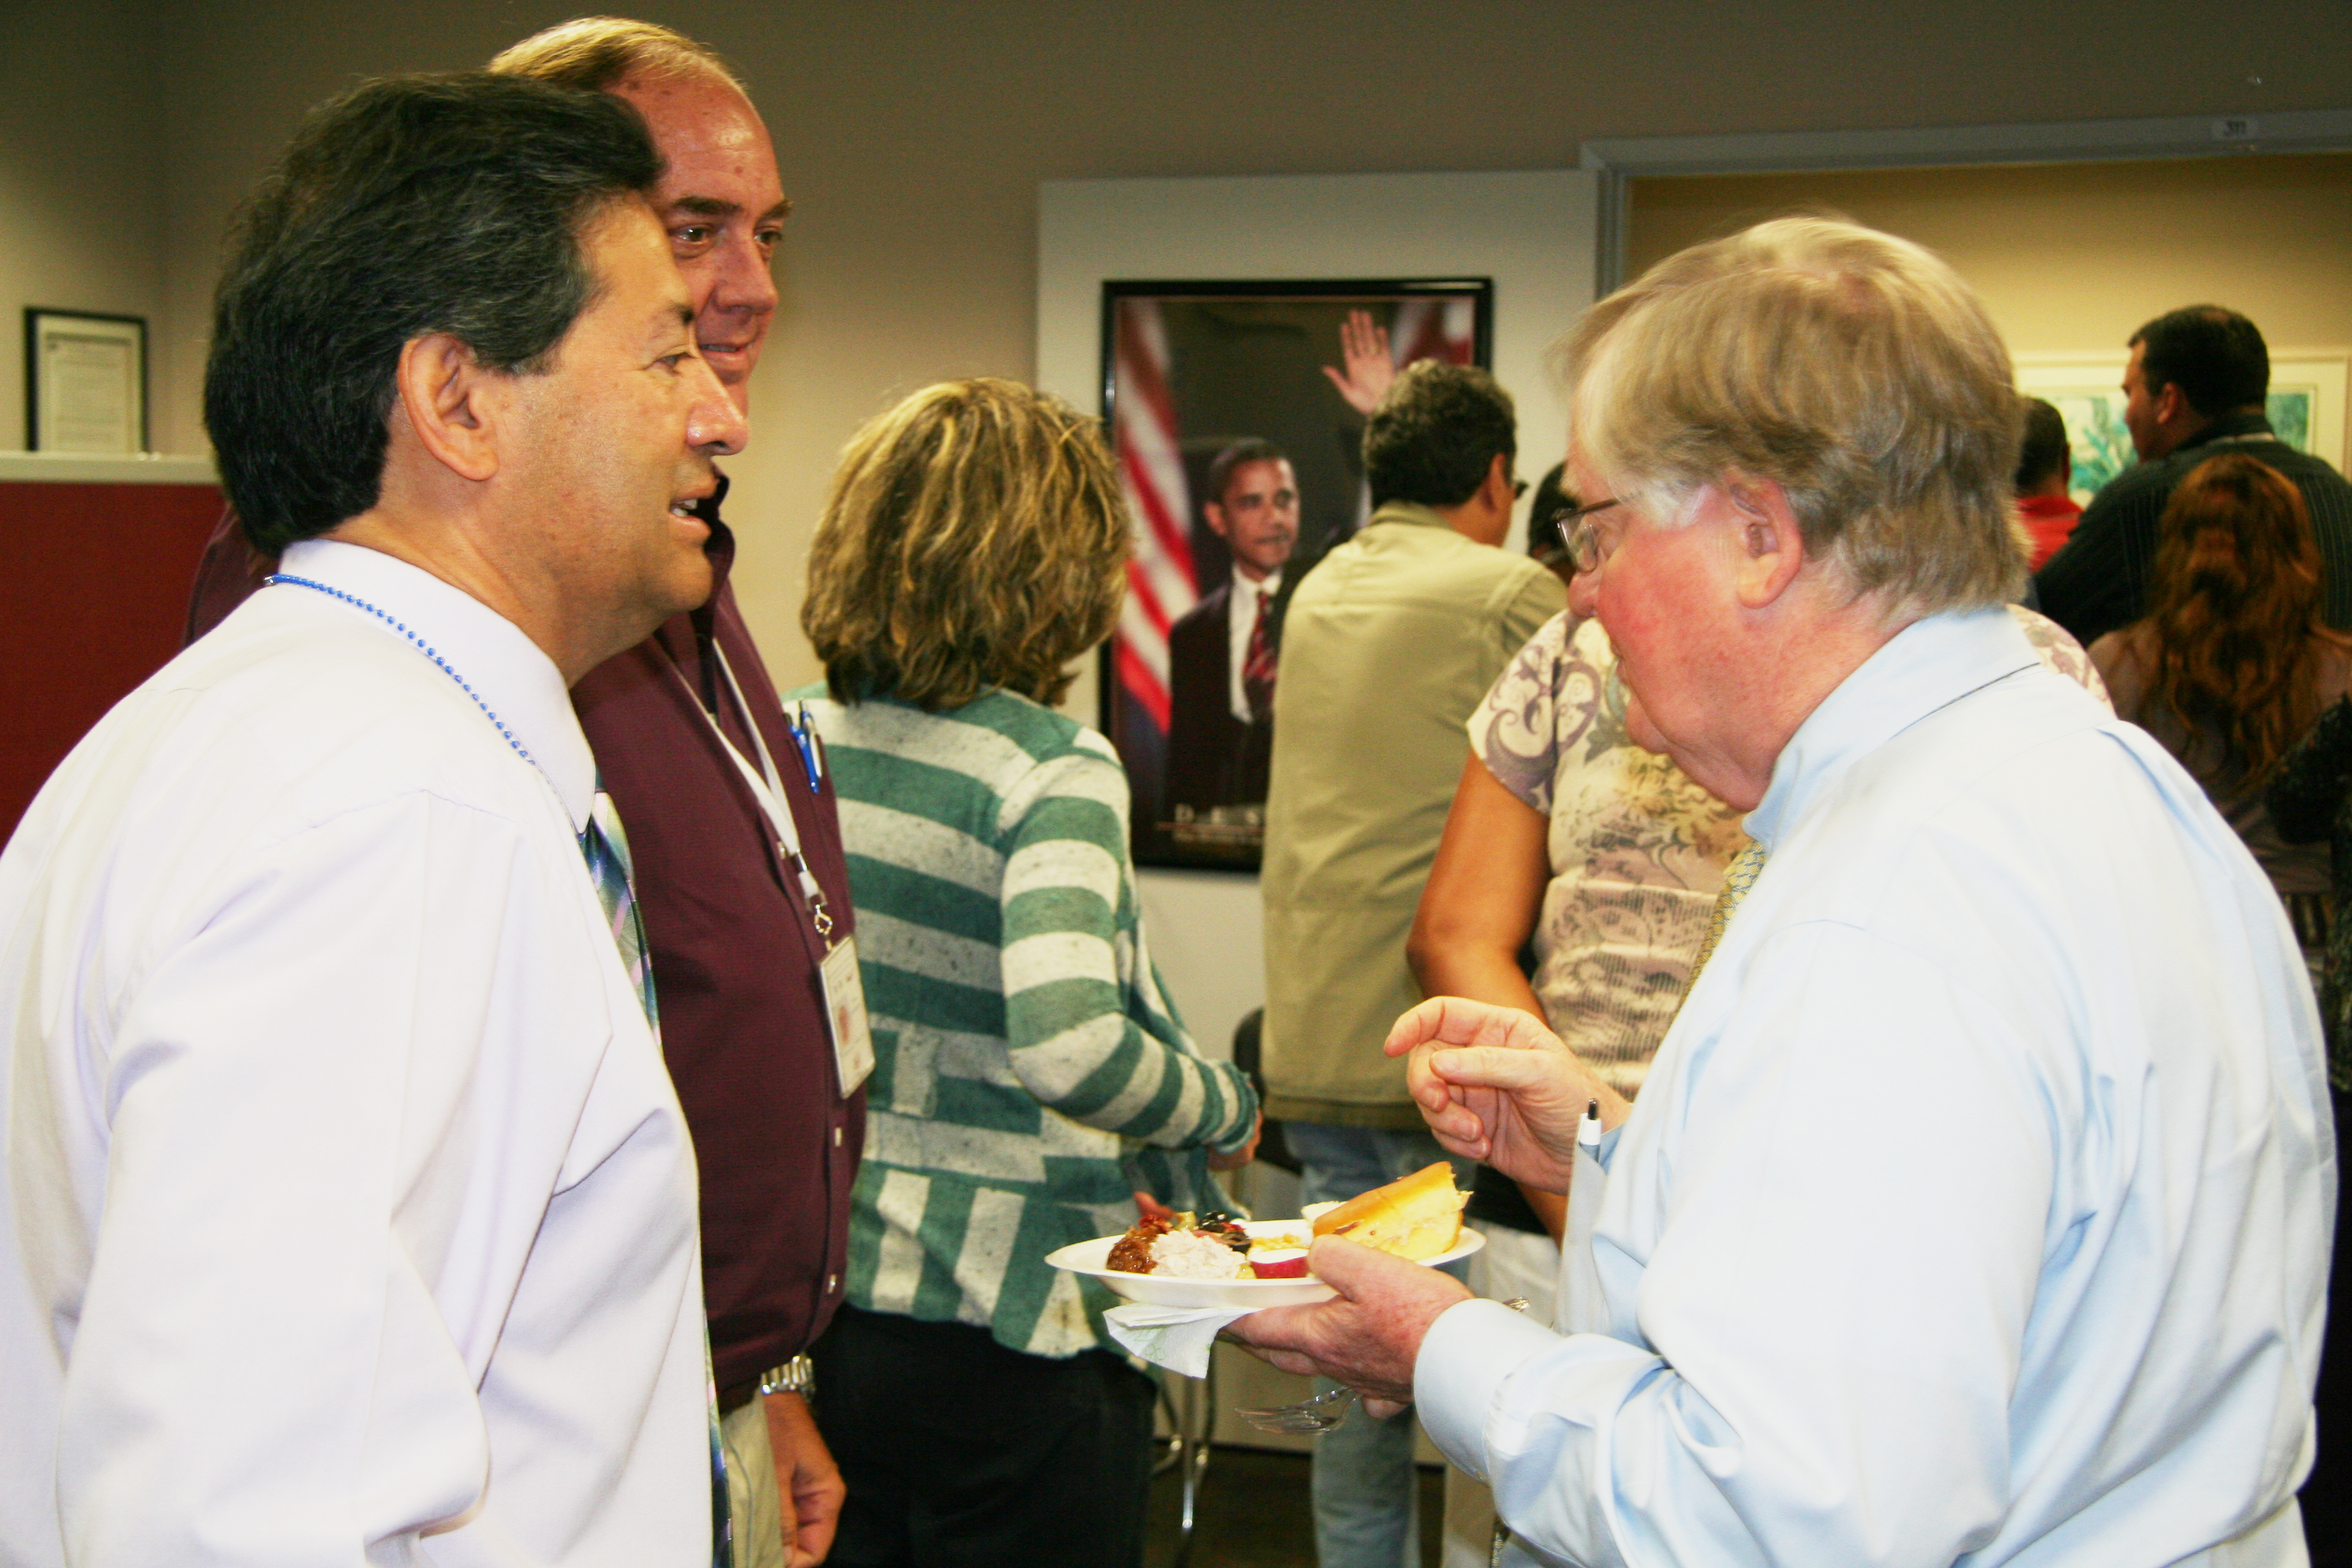 Governor Ashe Commends Martí Staff